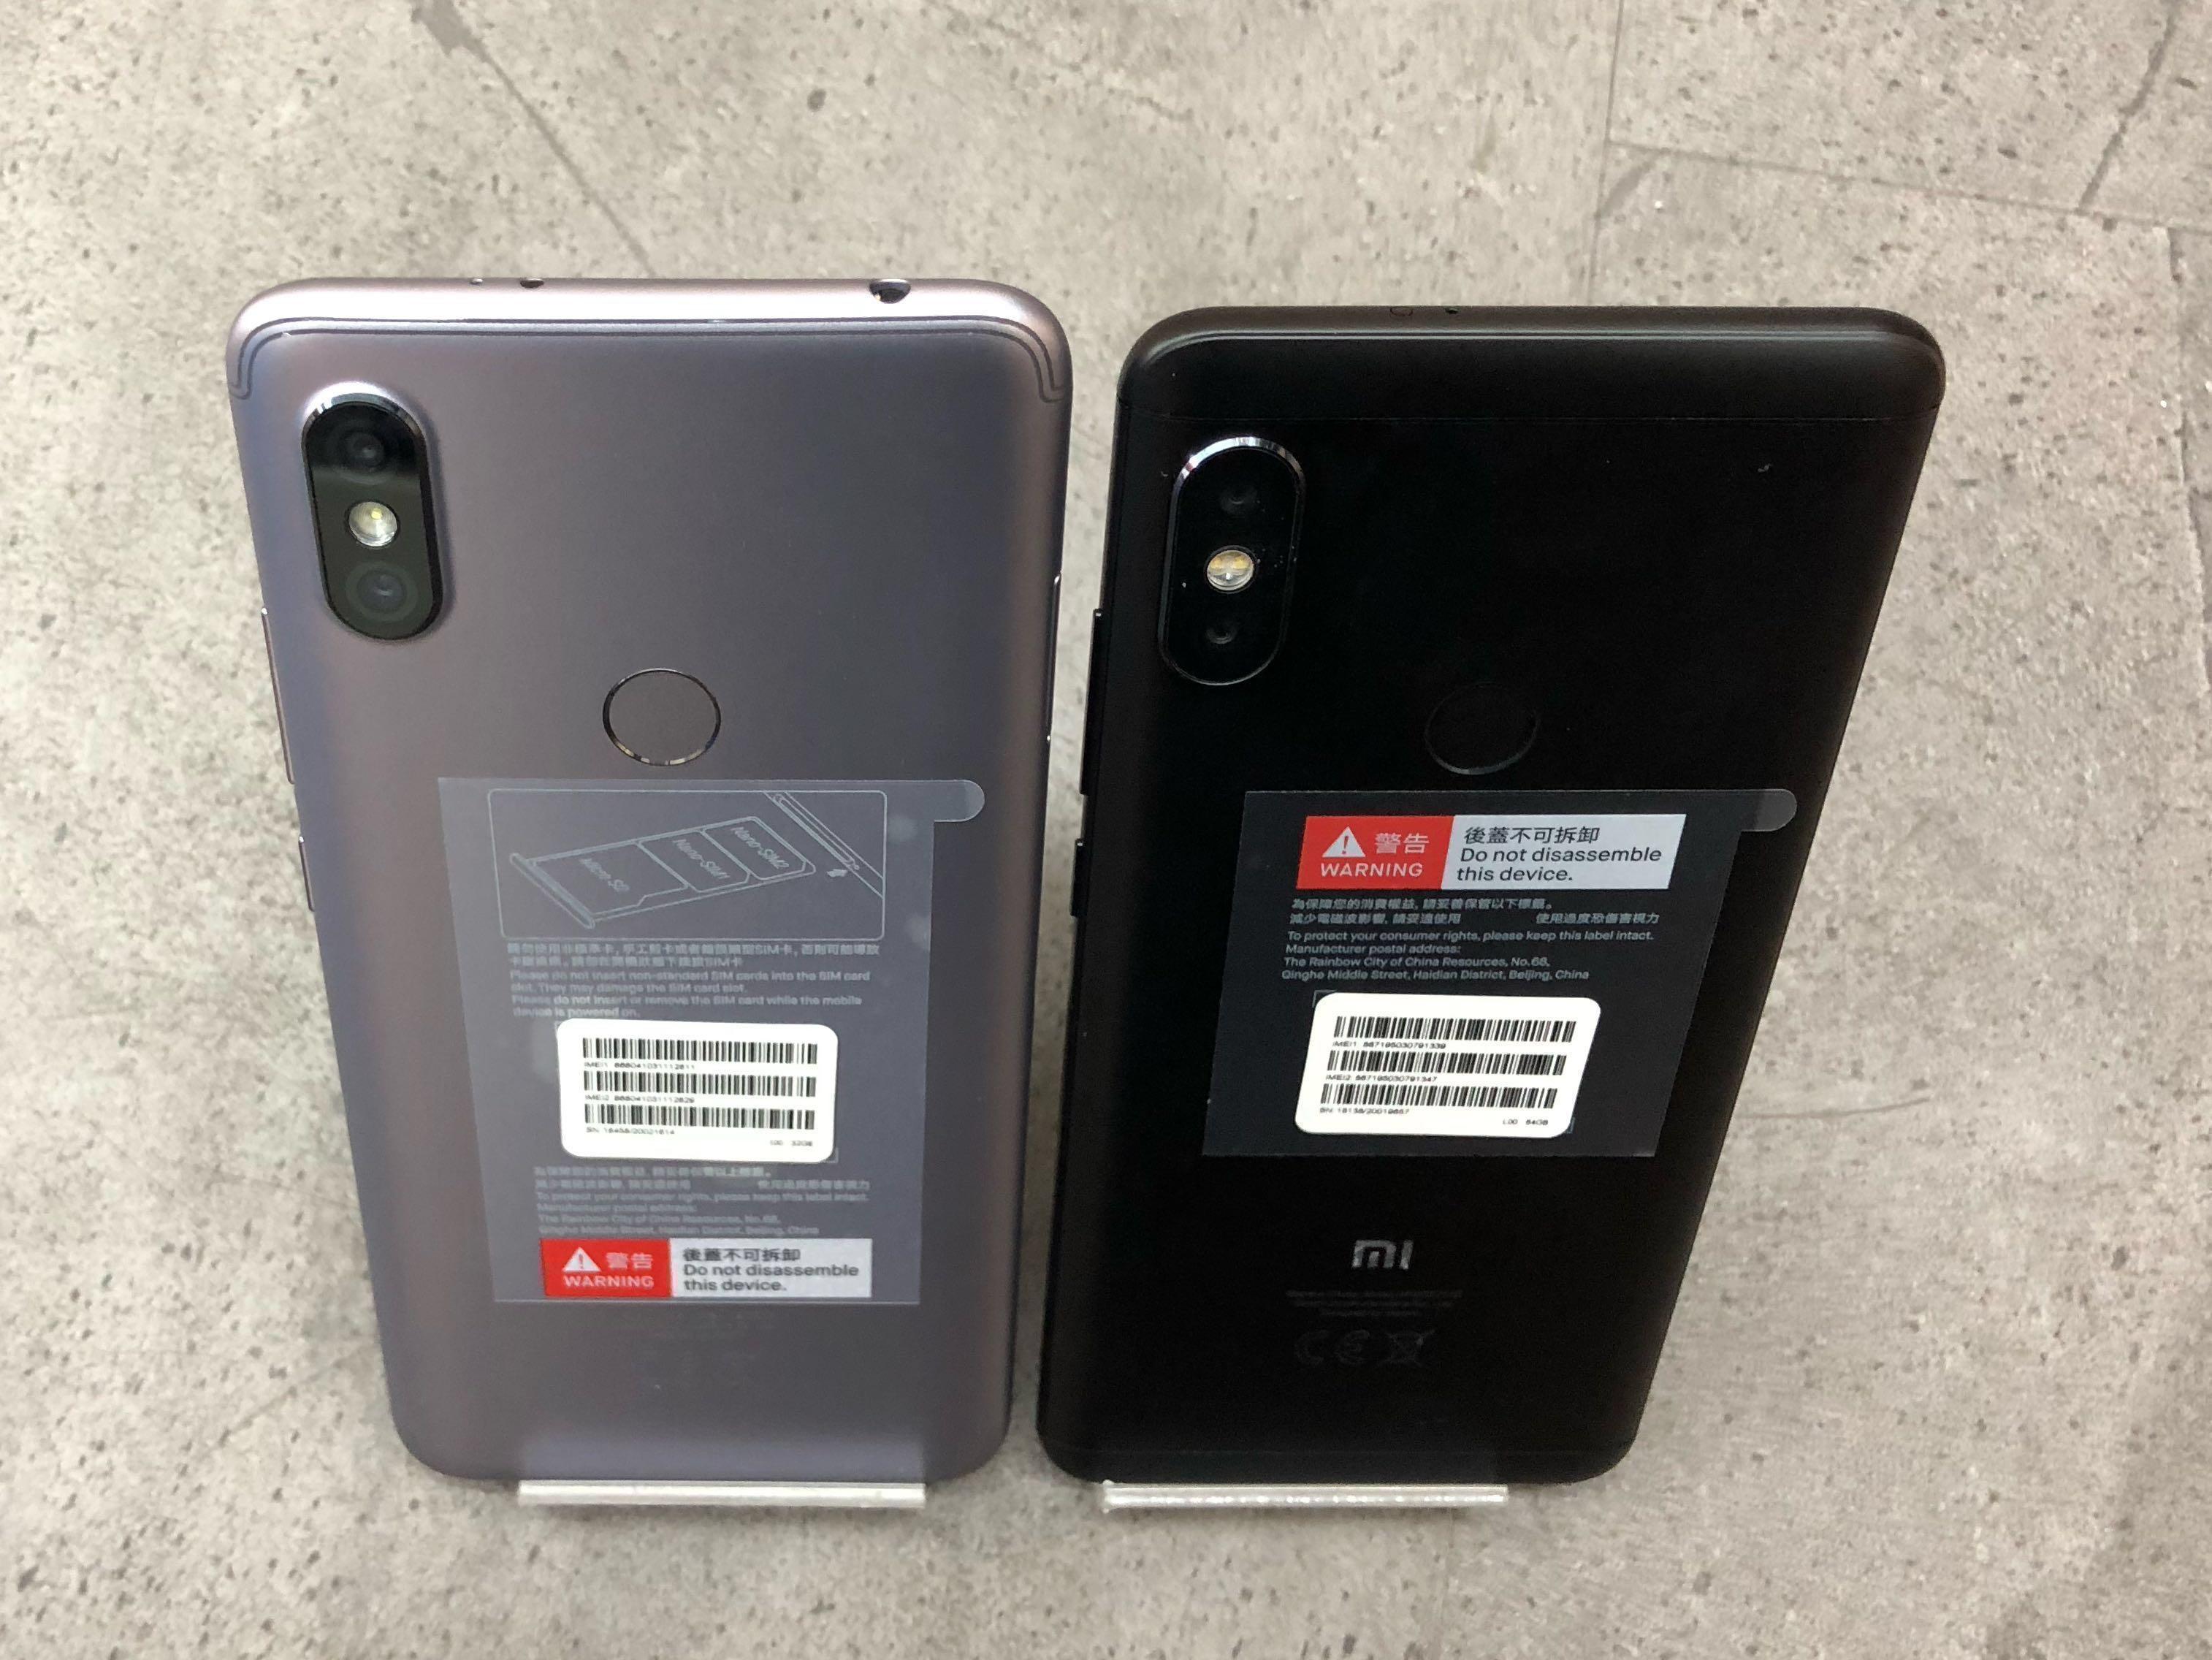 Xiaomi Redmi 5 Plus 4 64gb 599 Mobiles Tablets Android Phones 5a Ram 3gb Rom 32gb Grey Distri Share This Listing